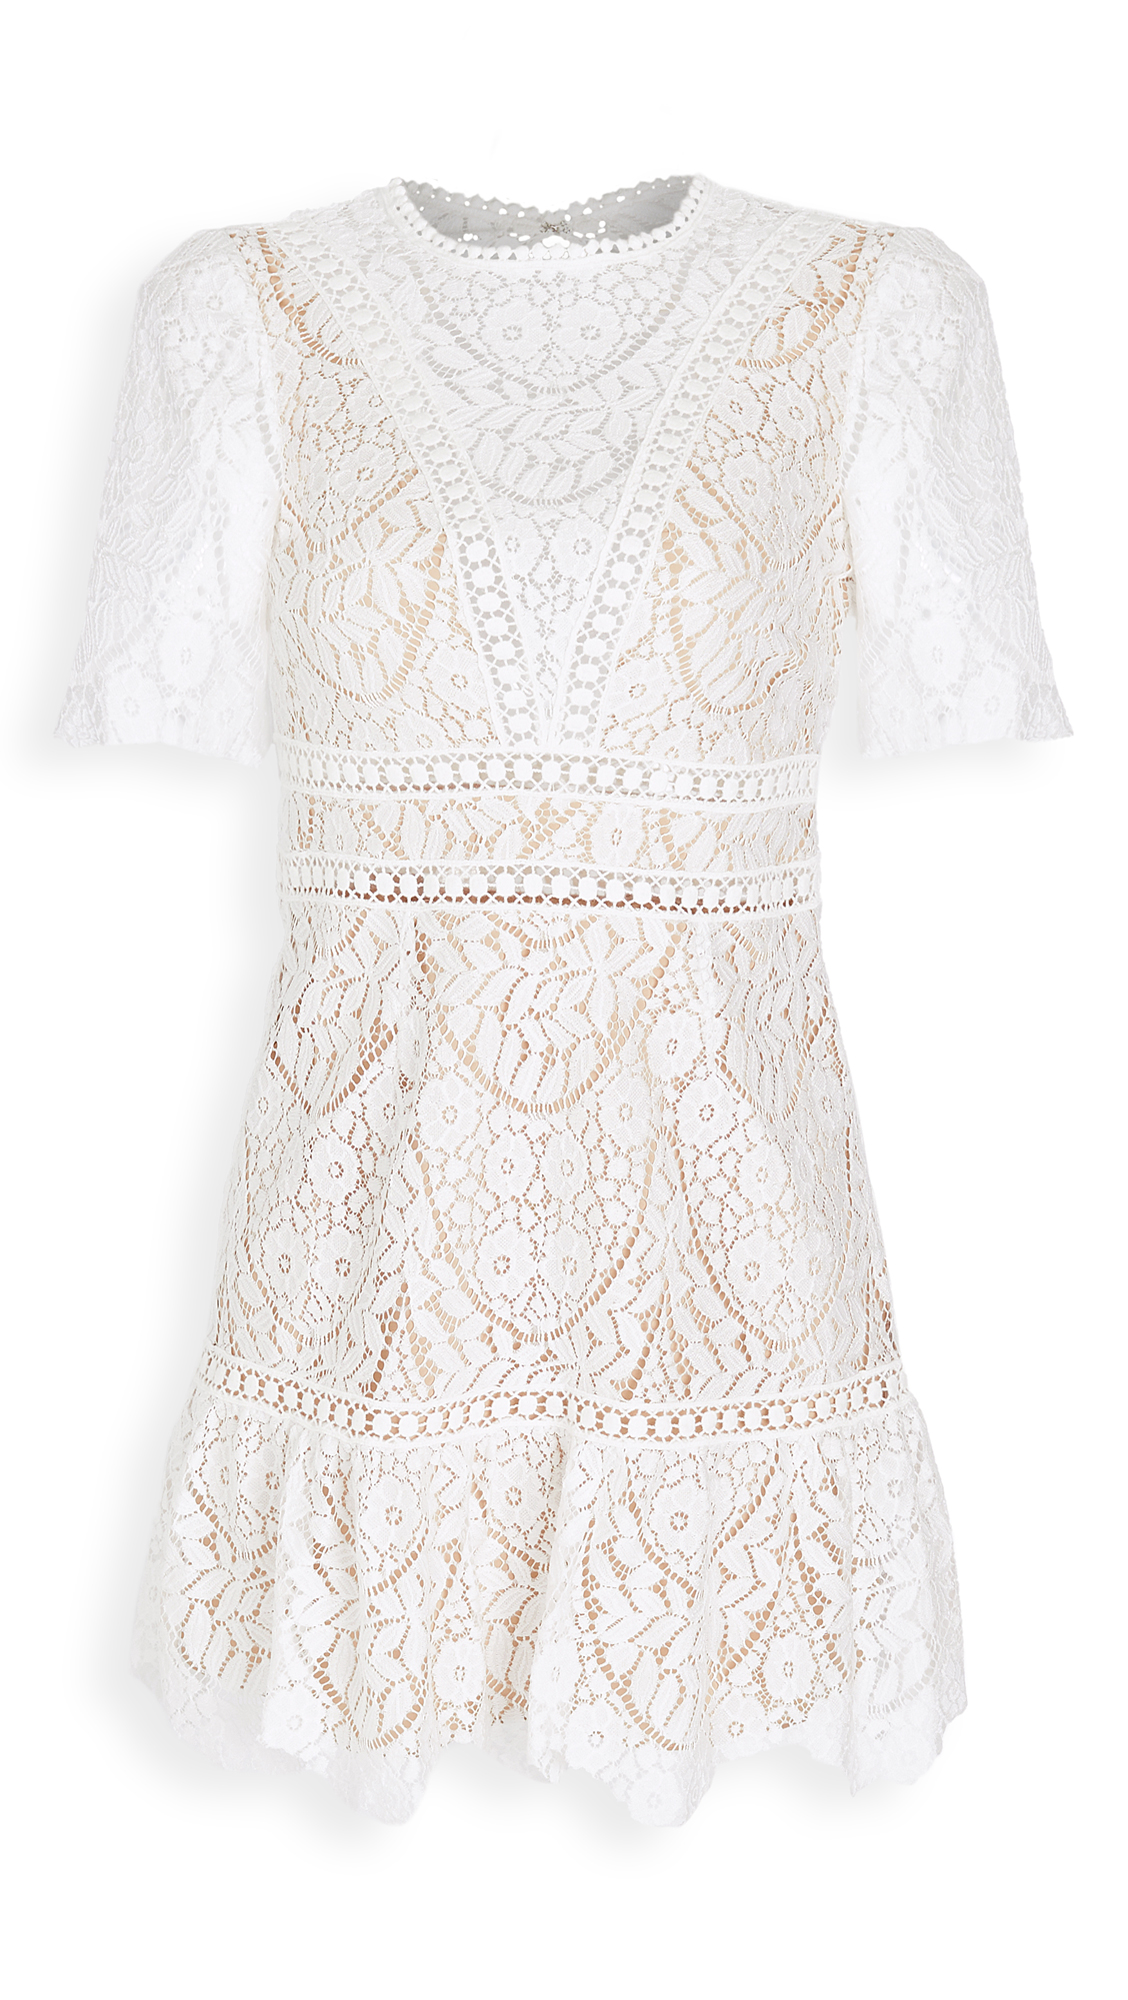 Saylor Darian Lace Mini Dress - 30% Off Sale